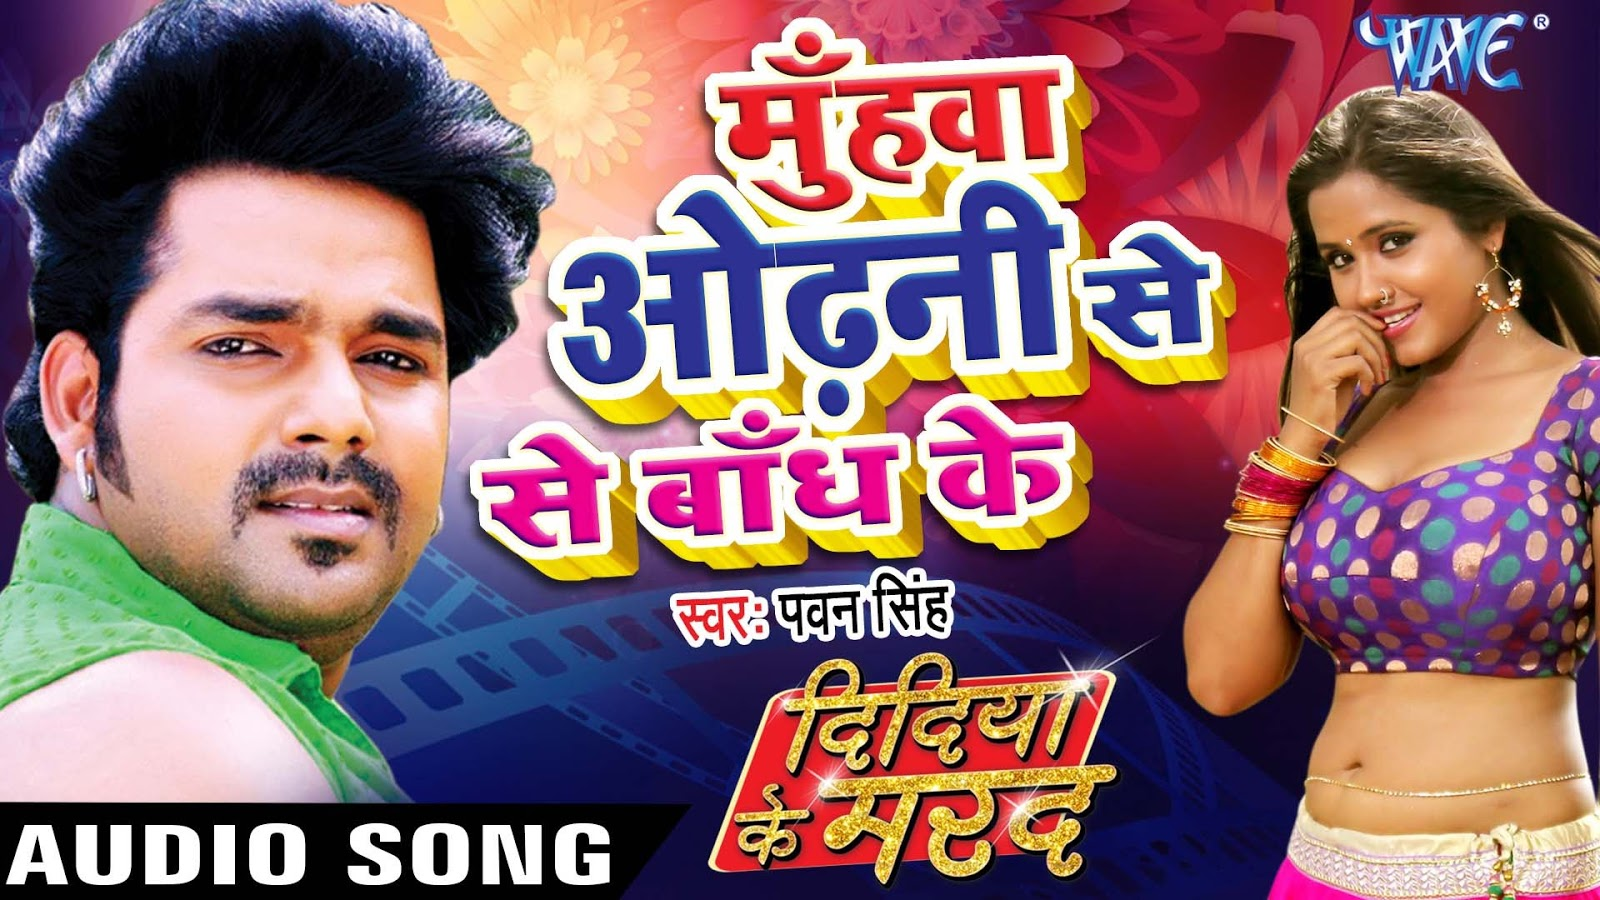 Bhojpuri holi album video song apk download | apkpure. Co.